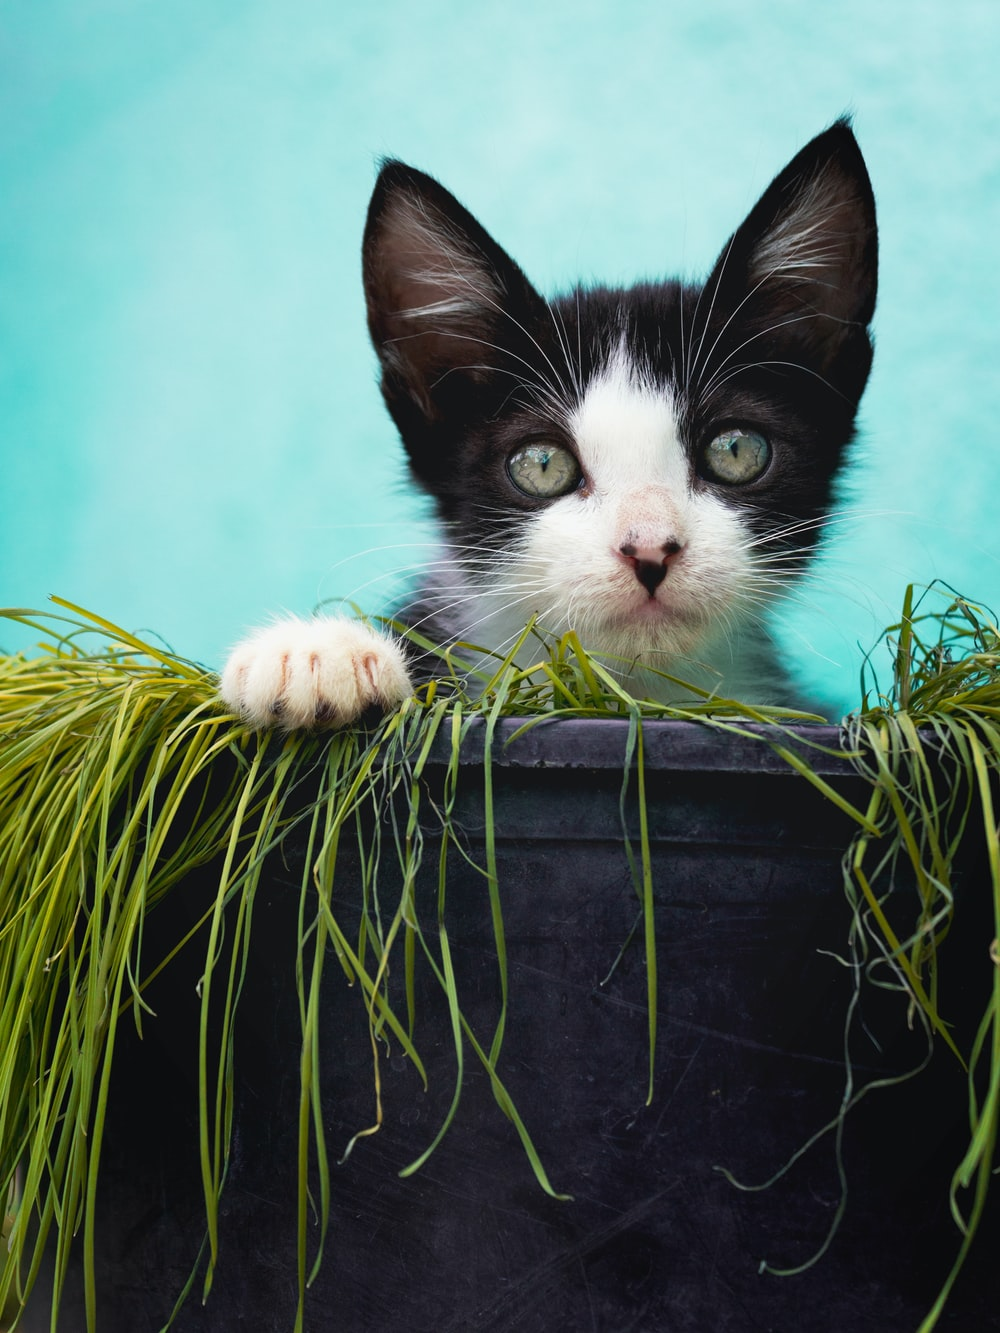 black and white cat on black pot